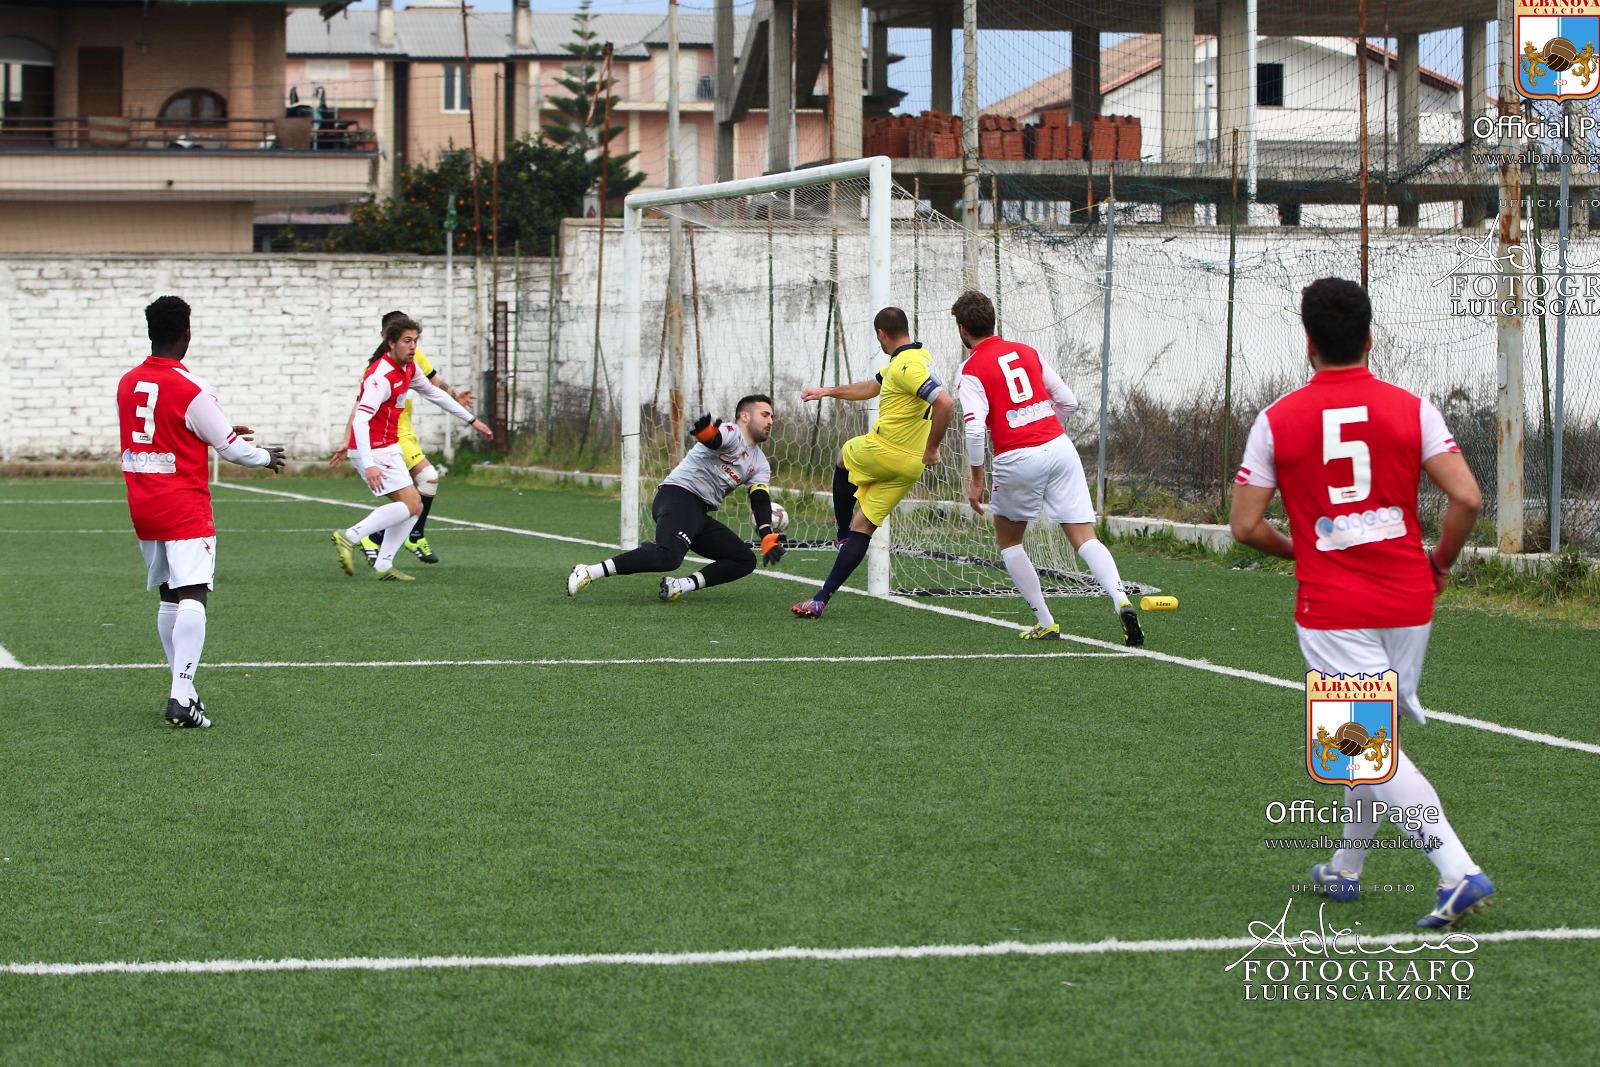 L'Albanova ribalta la Virtus Goti e si impone 3-2